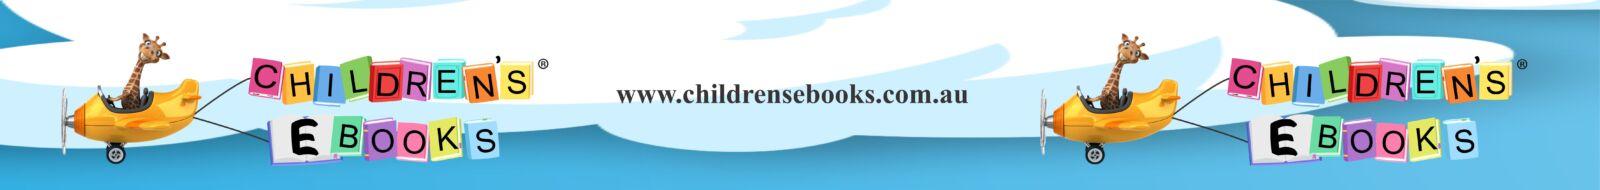 CHILDREN'S EBOOKS, banner